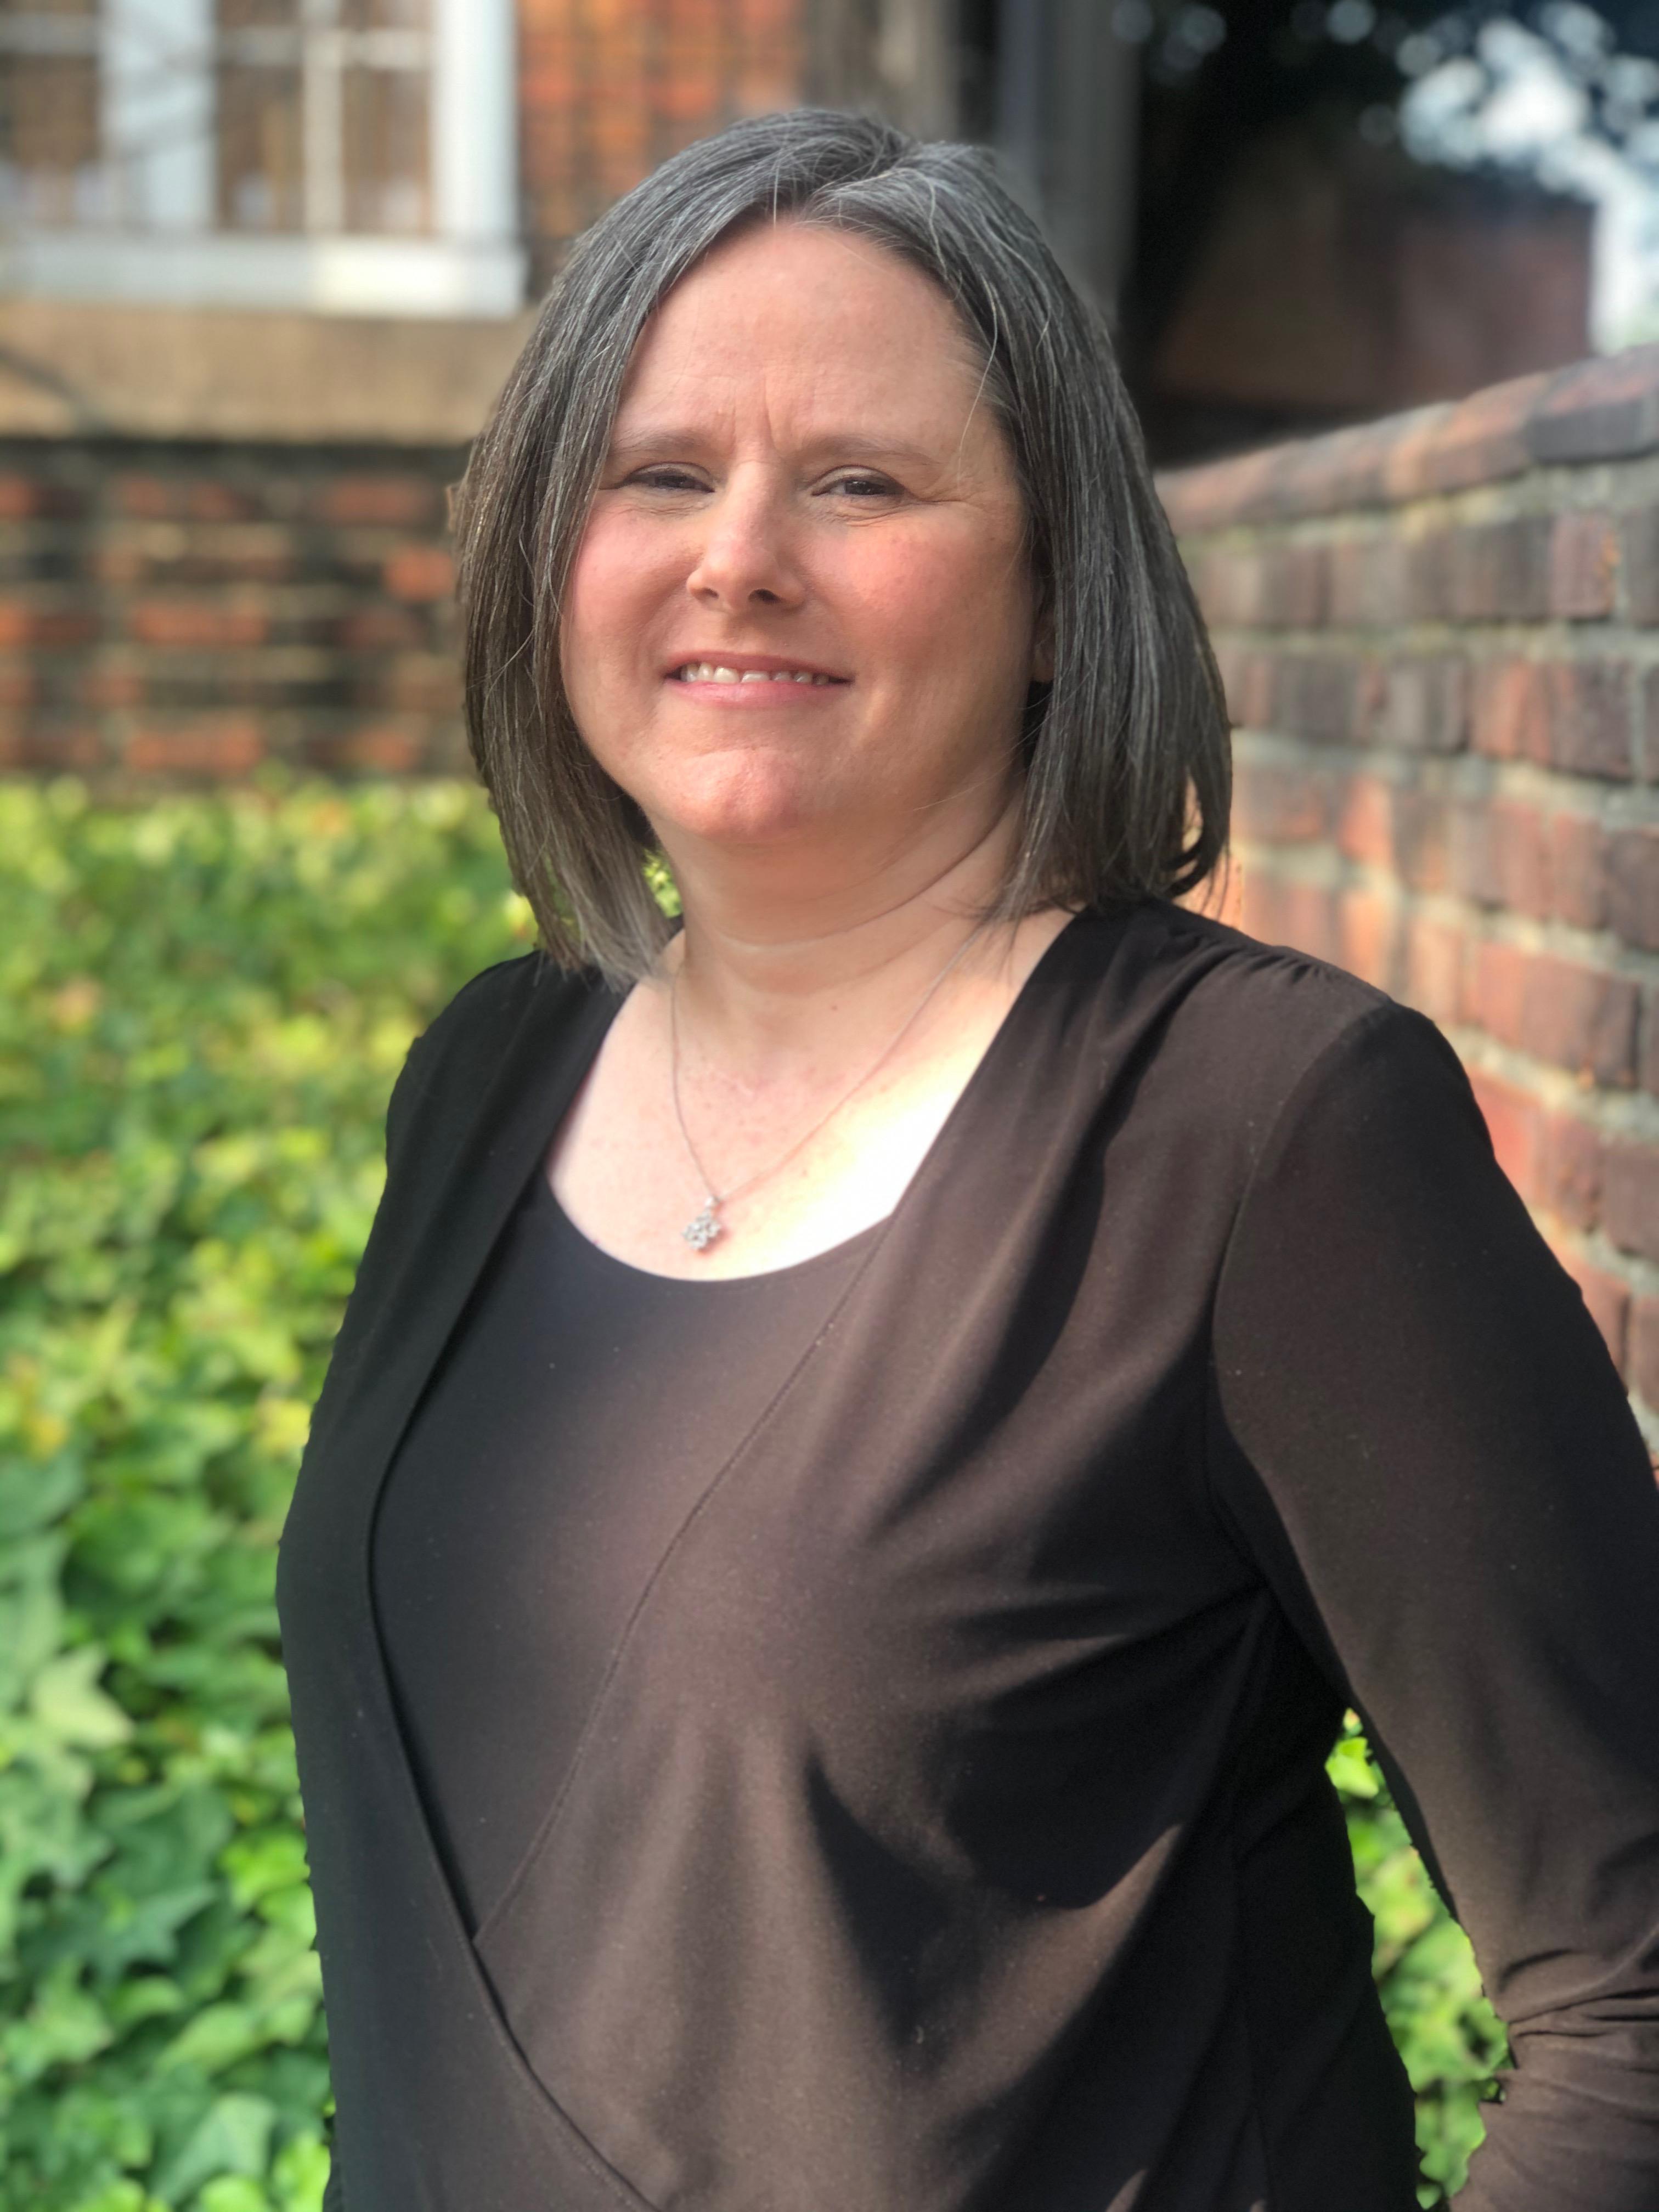 Jeanne Hollingshead, LCSW